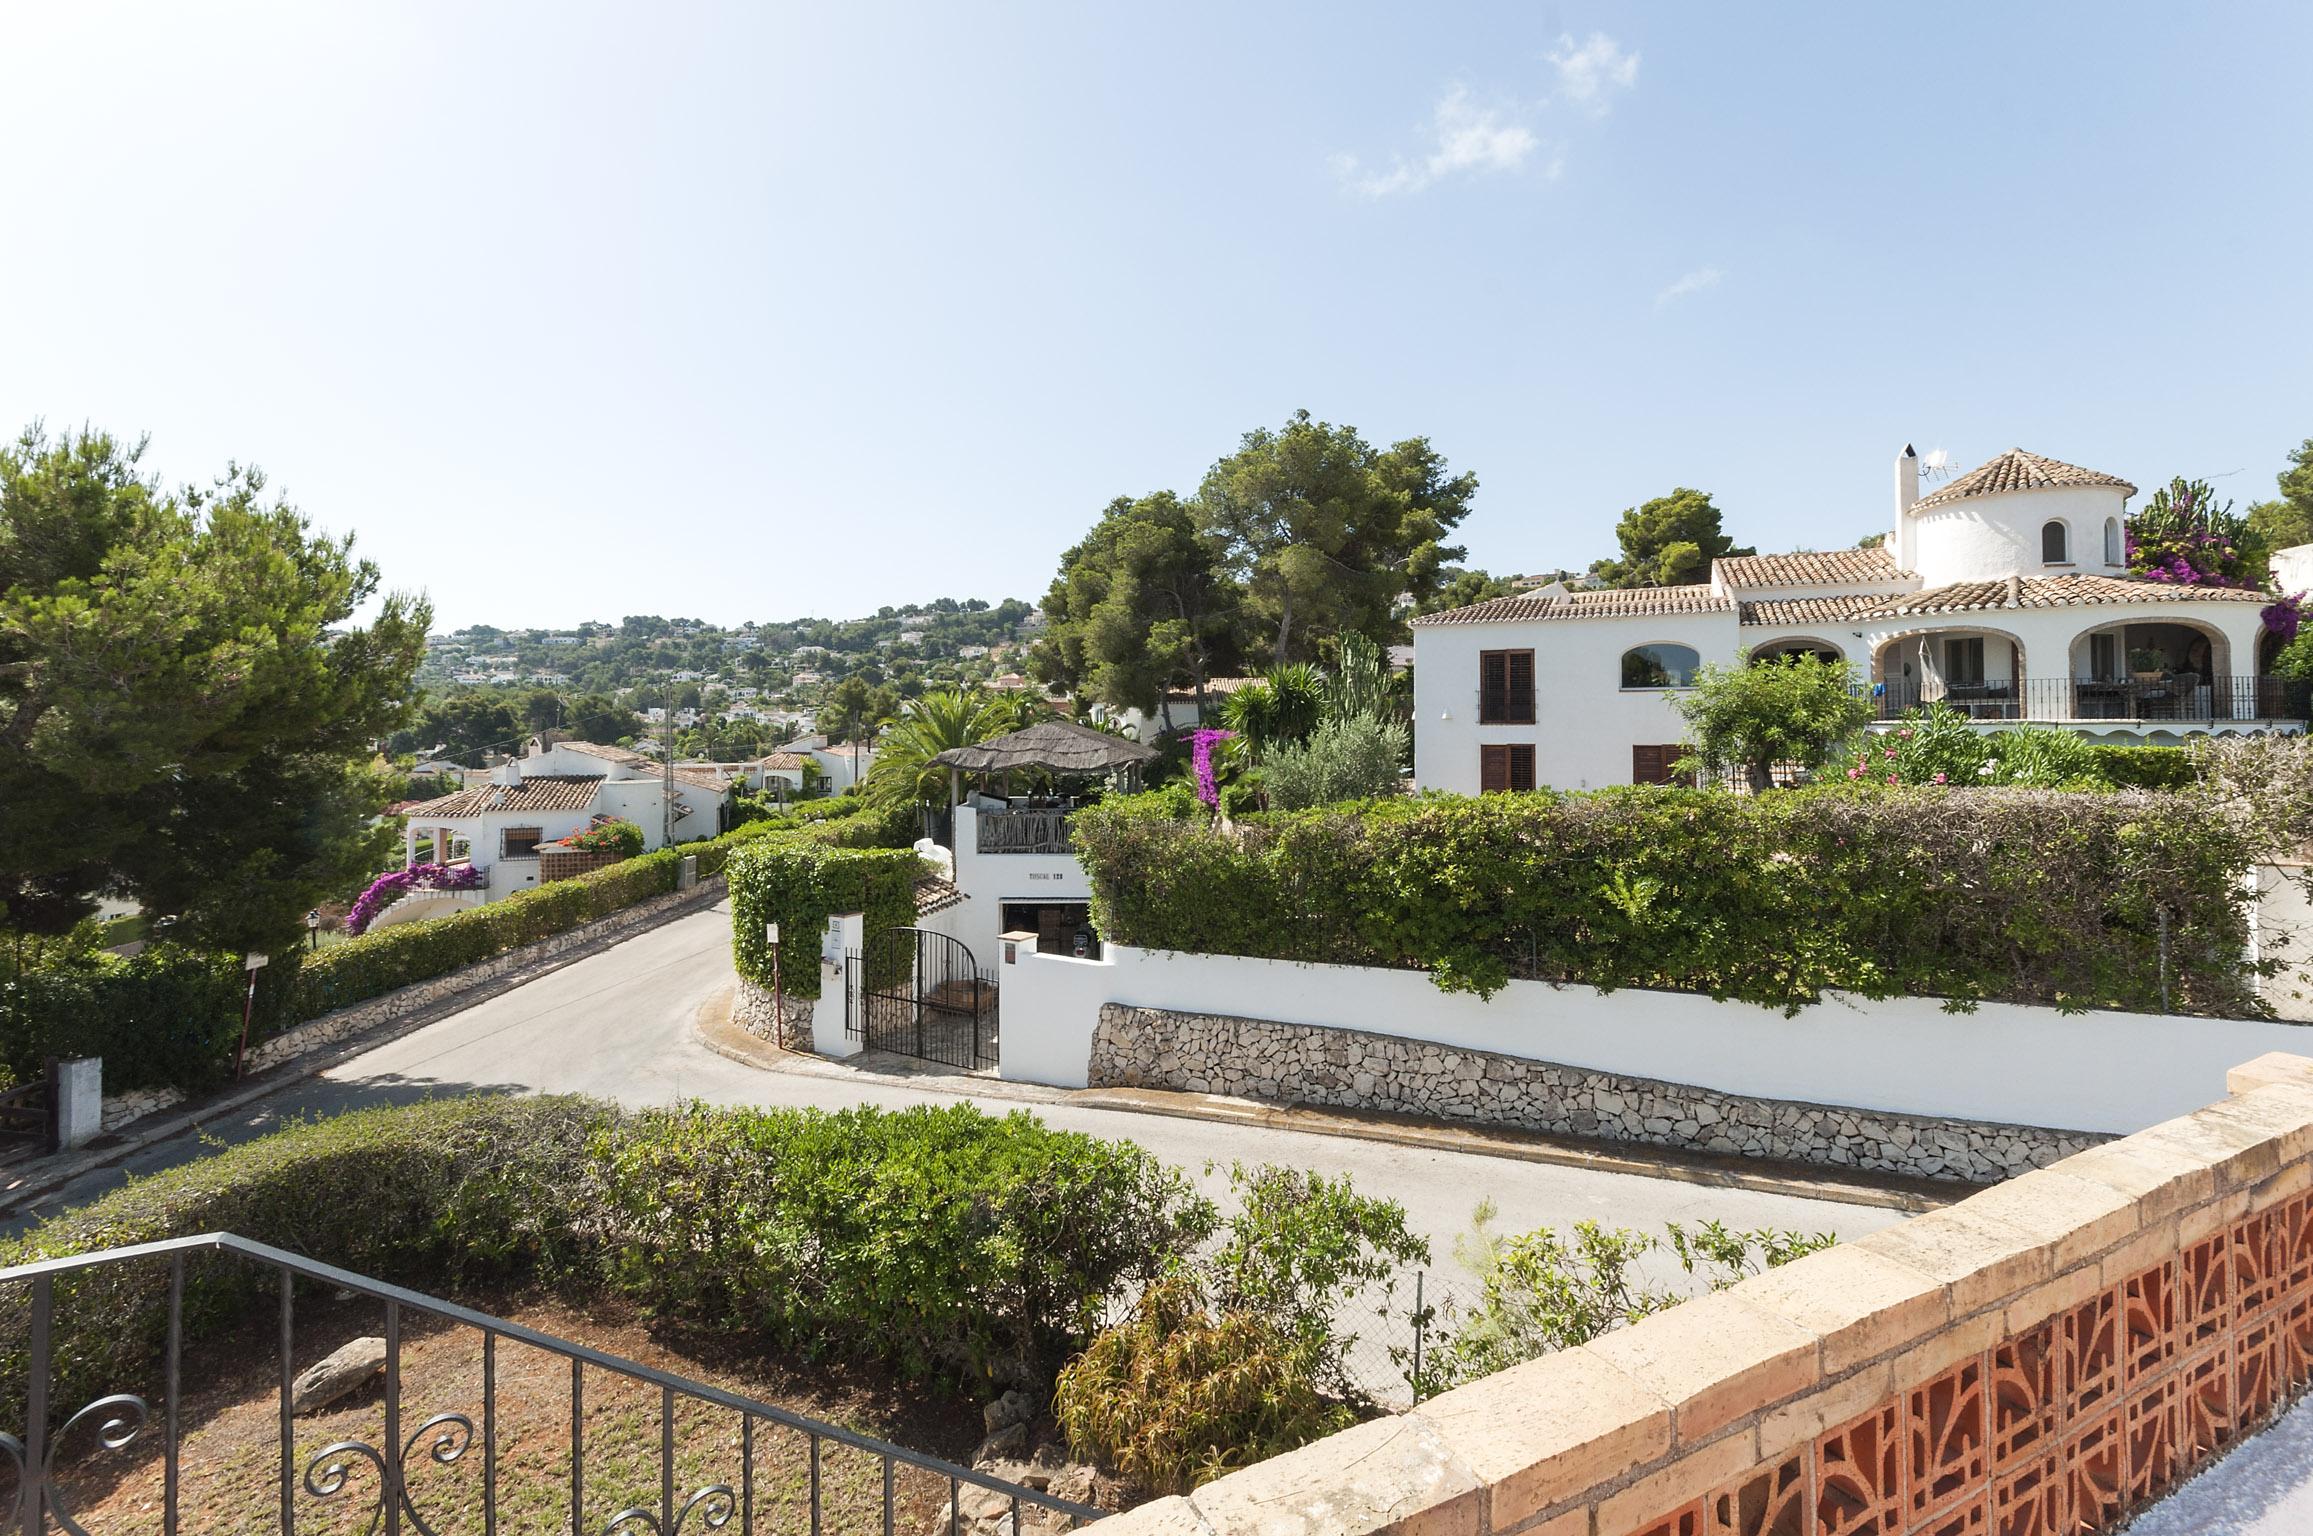 Ferienhaus SANDRA (2032472), Portichol, Costa Blanca, Valencia, Spanien, Bild 22